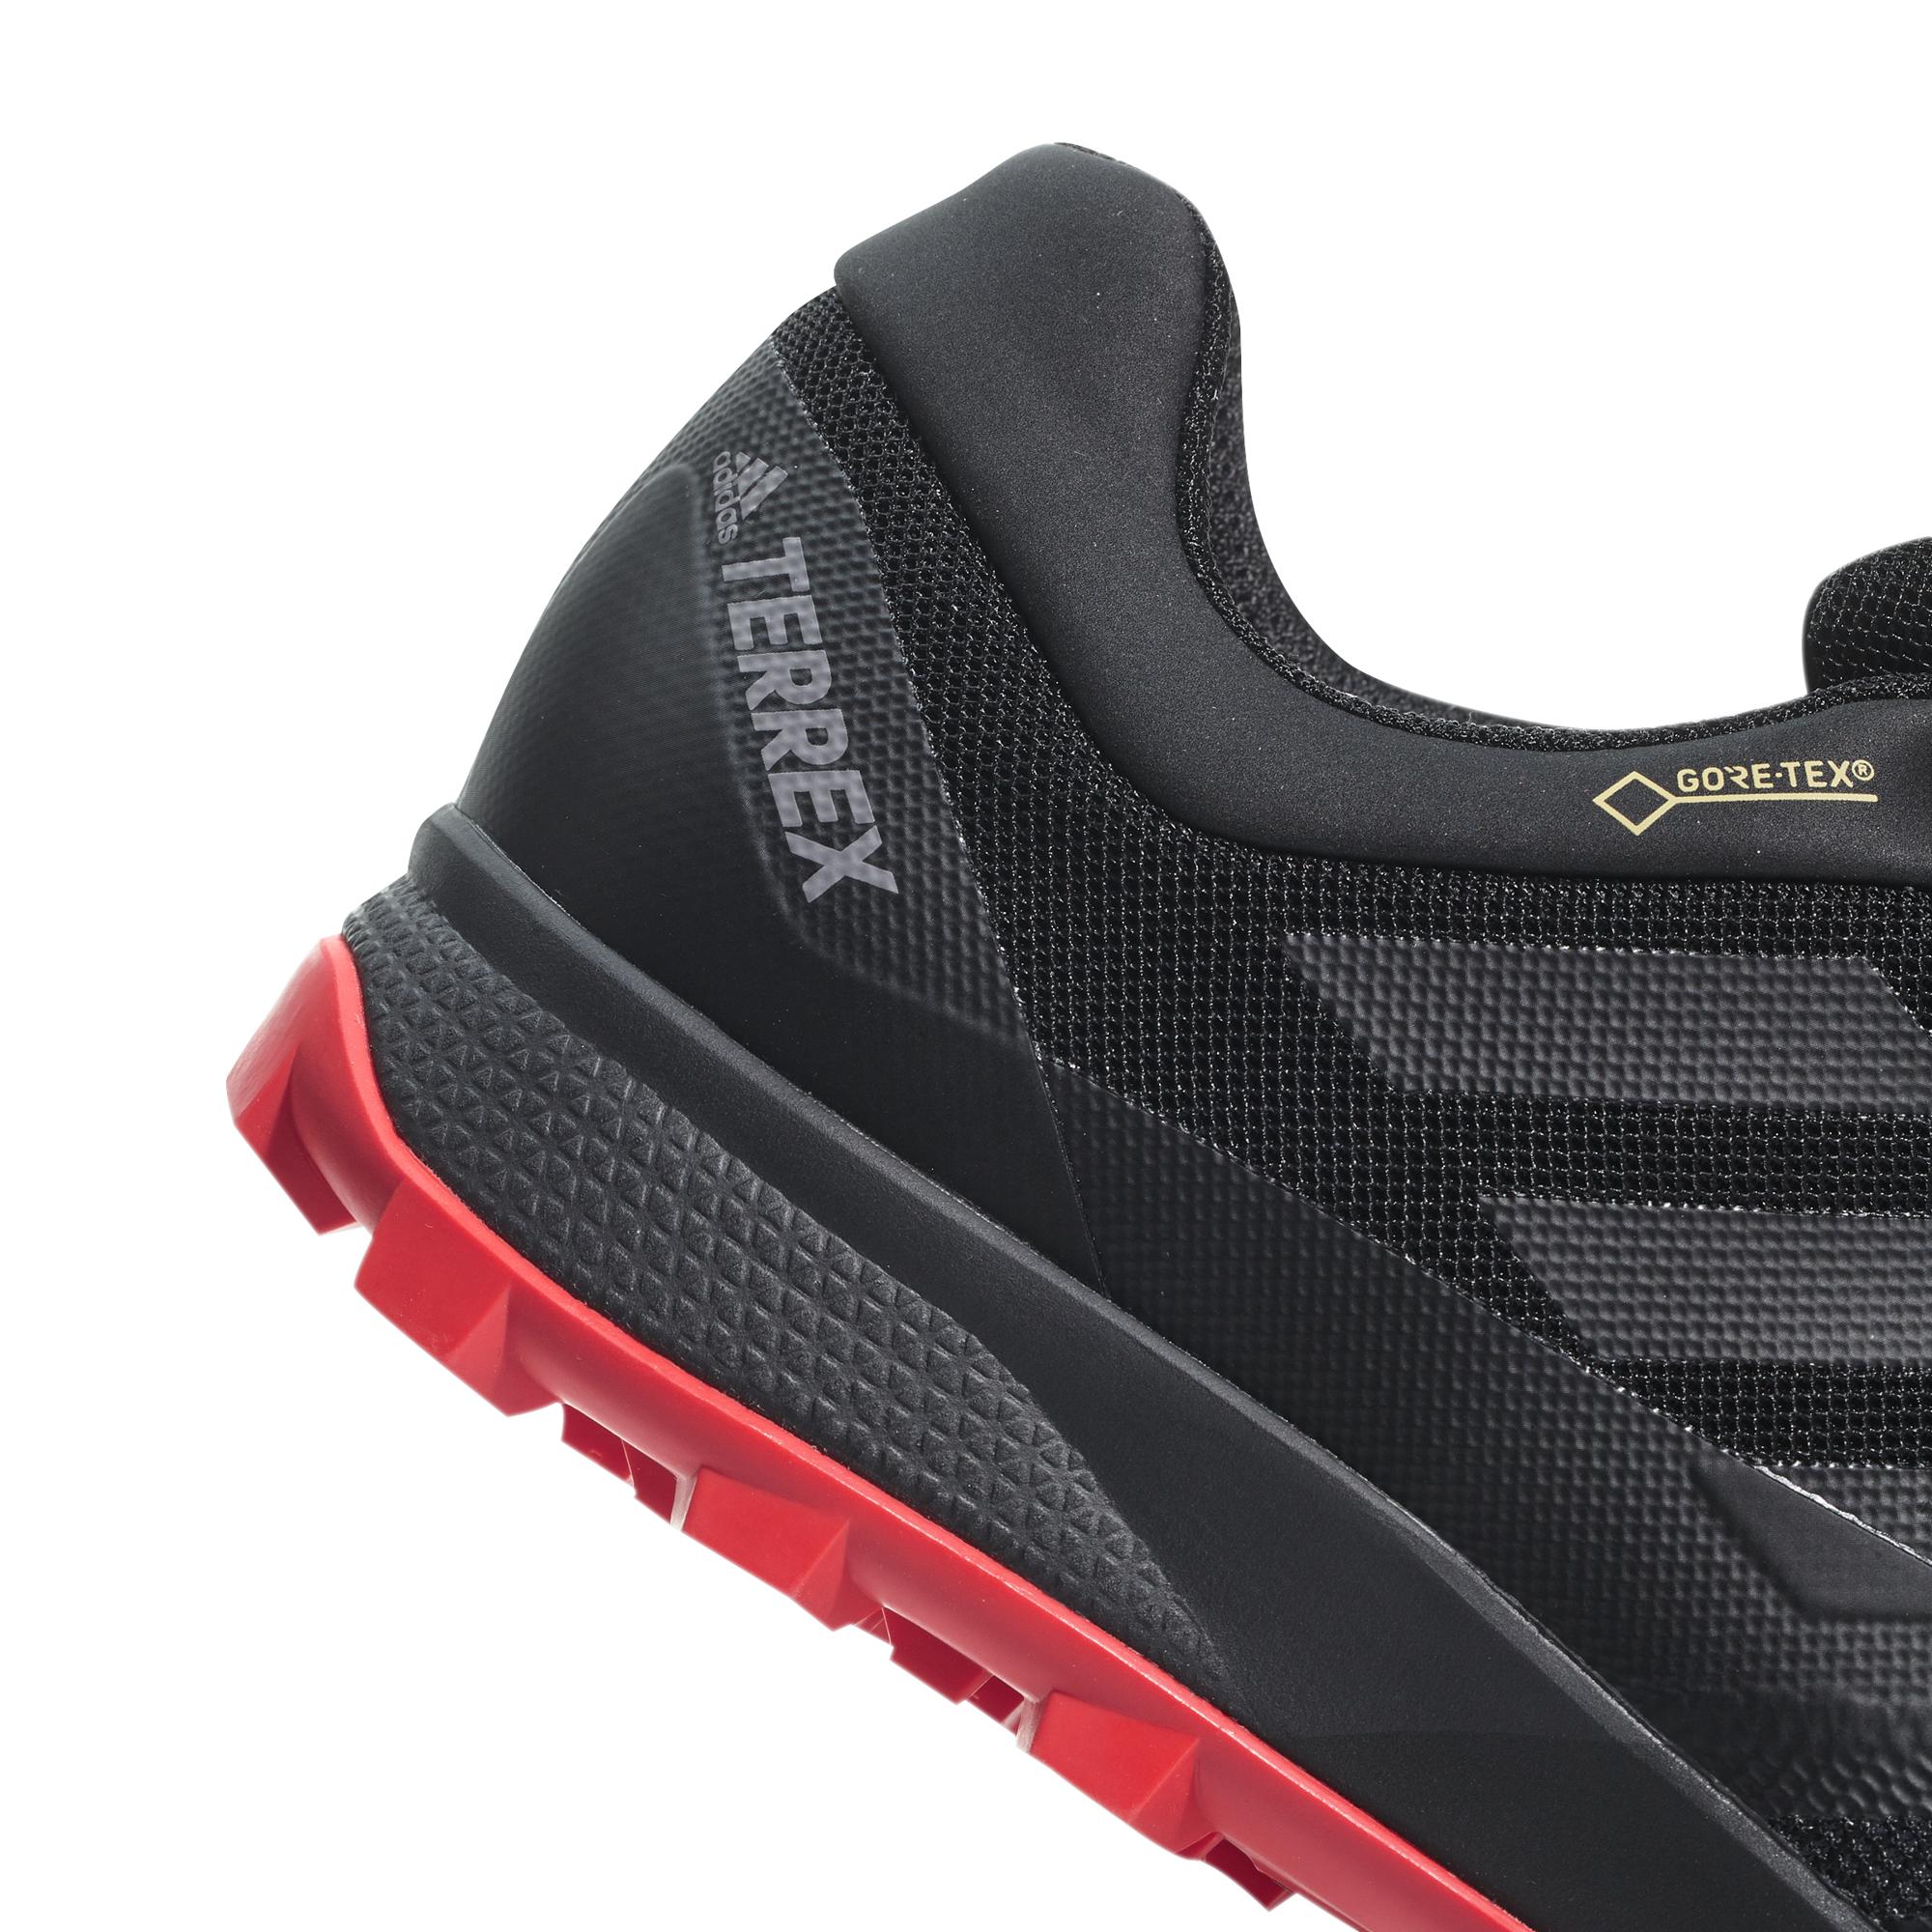 CM7620 Sport ADIDAS Terrex Trailmaker GTX Herren Schuhe